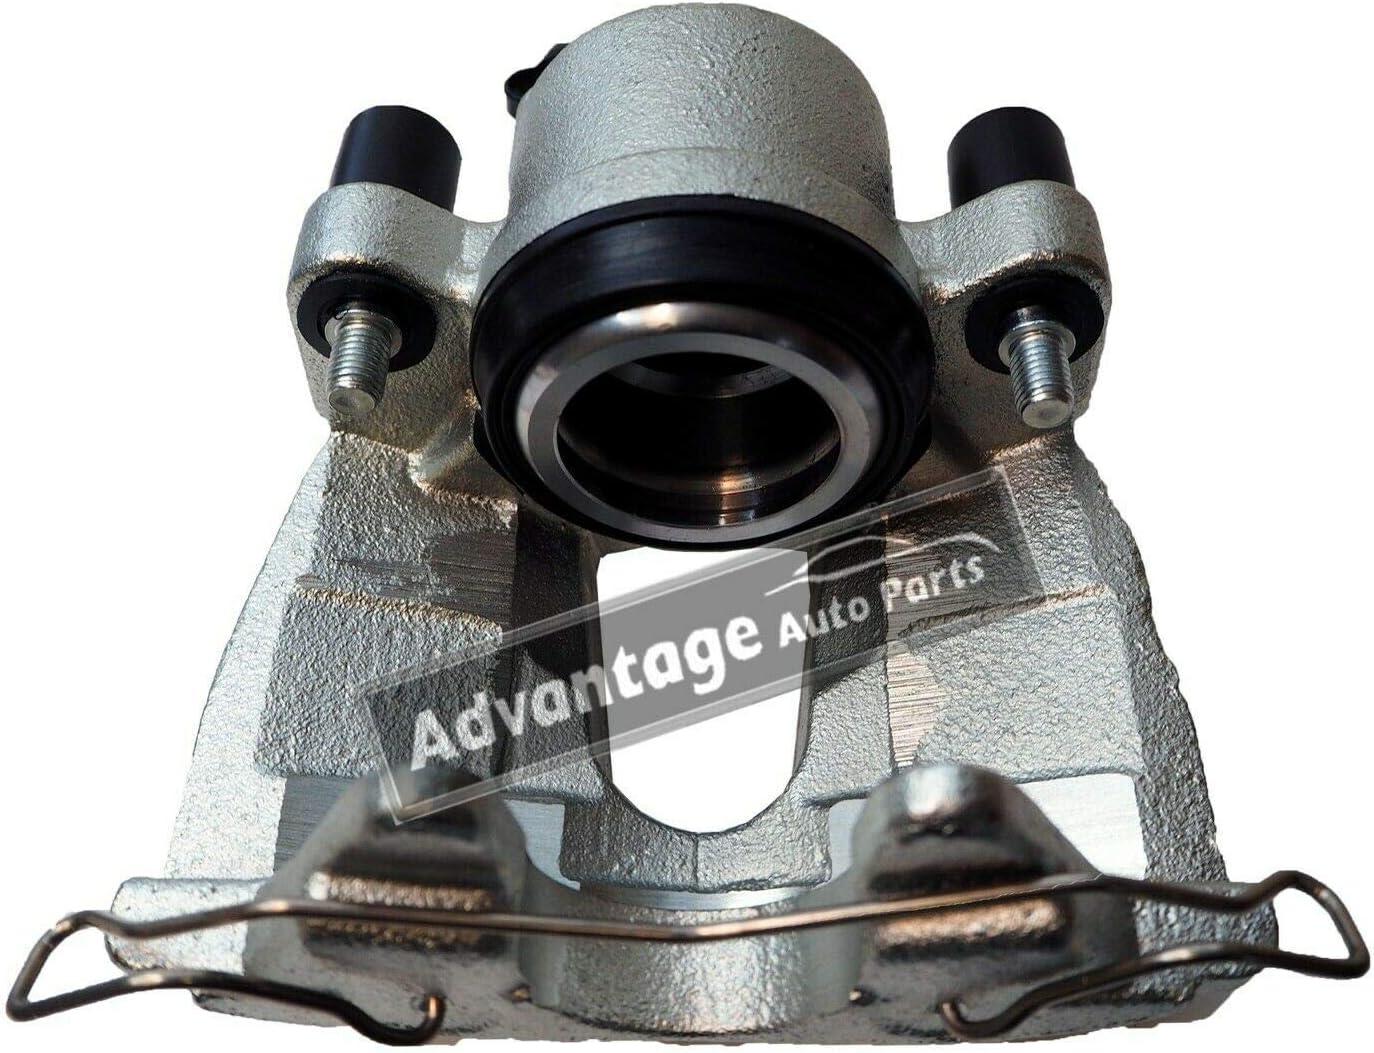 2003Onward OE 1223616 S40 Mk2 533 542 Advantage Brake Caliper Front Nearside Left Fits C30 544 525, 526 V50 C70 Mk2 V40 545